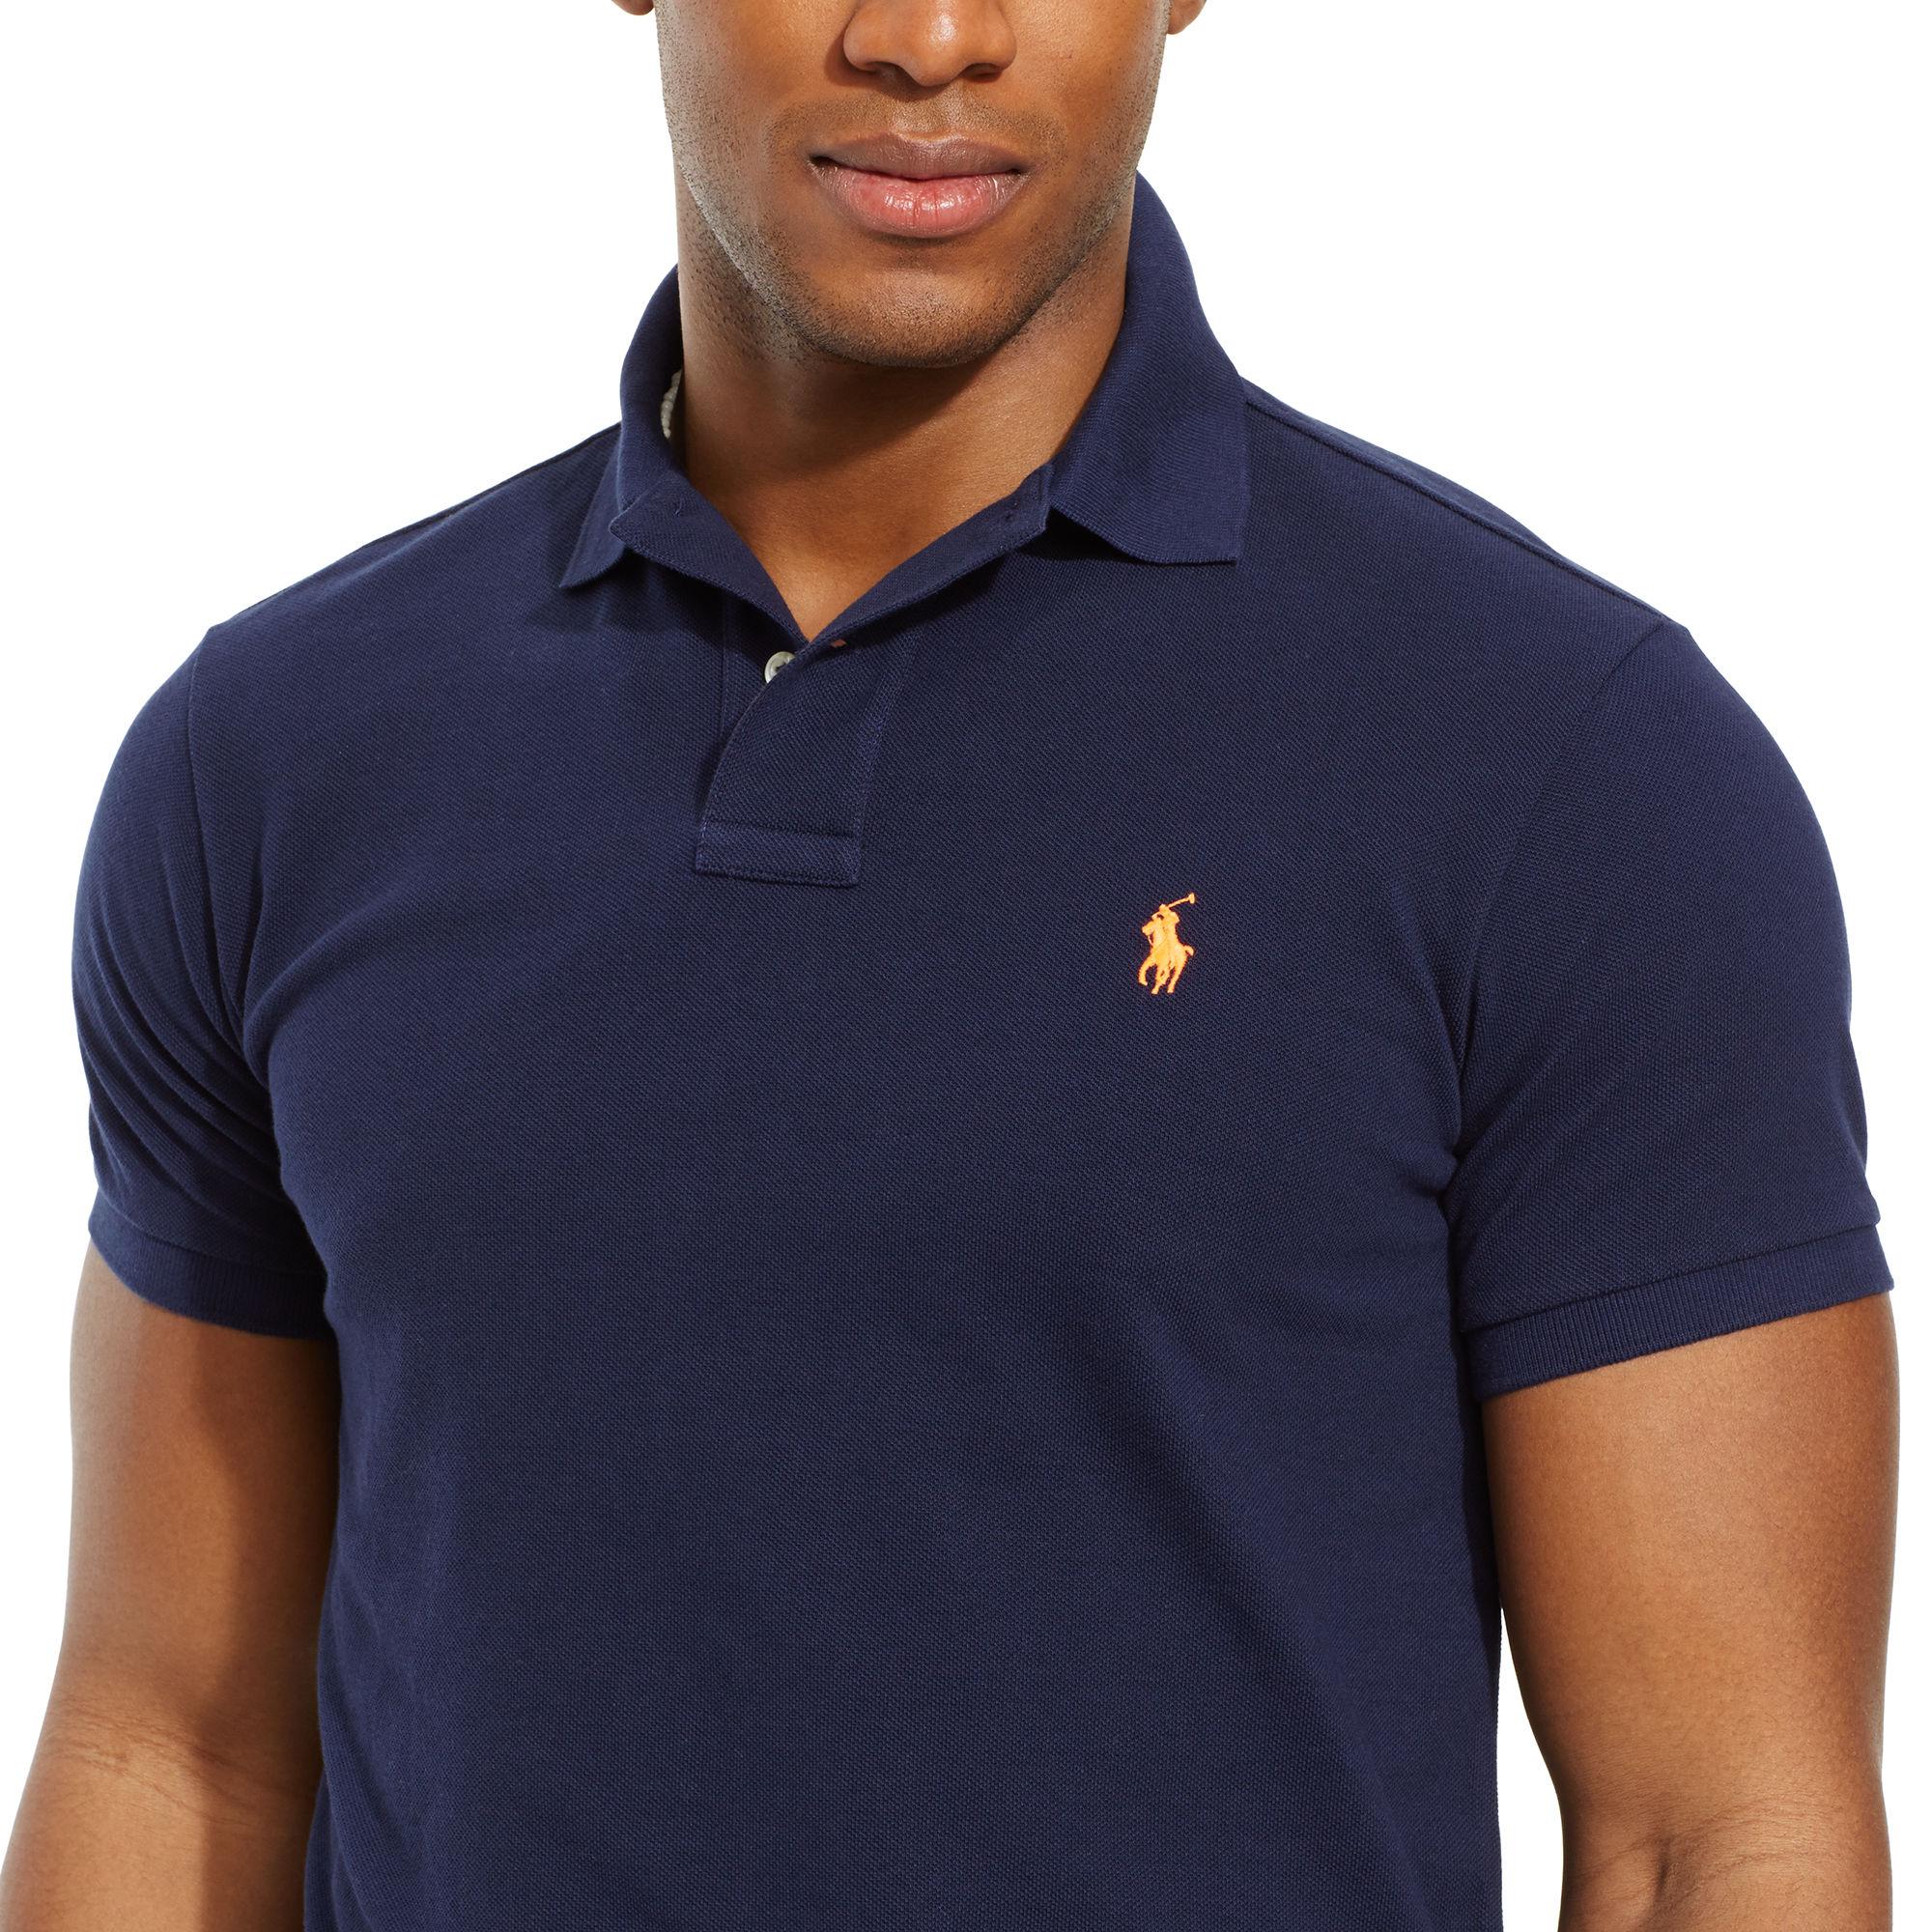 Polo Ralph Lauren Open Collar Polo Shirt in French (Blue